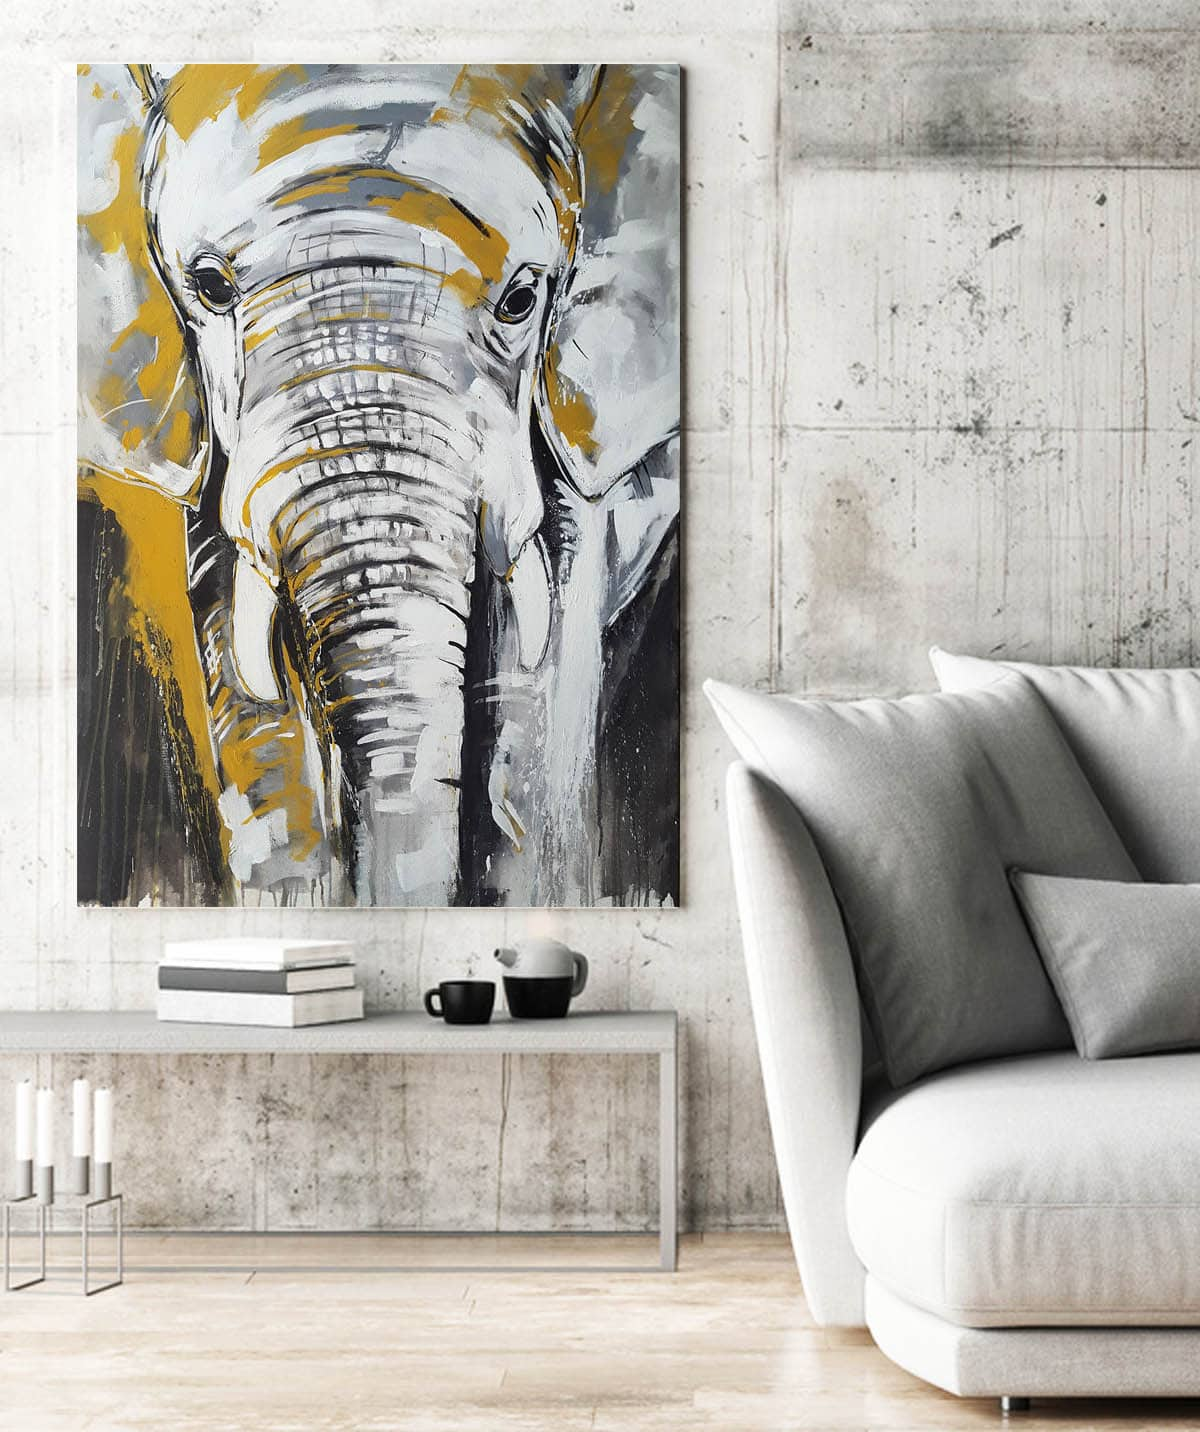 kunstdruck elefant exklusive wandbilder afrika kunst aus dem atelier von stefanie rogge. Black Bedroom Furniture Sets. Home Design Ideas